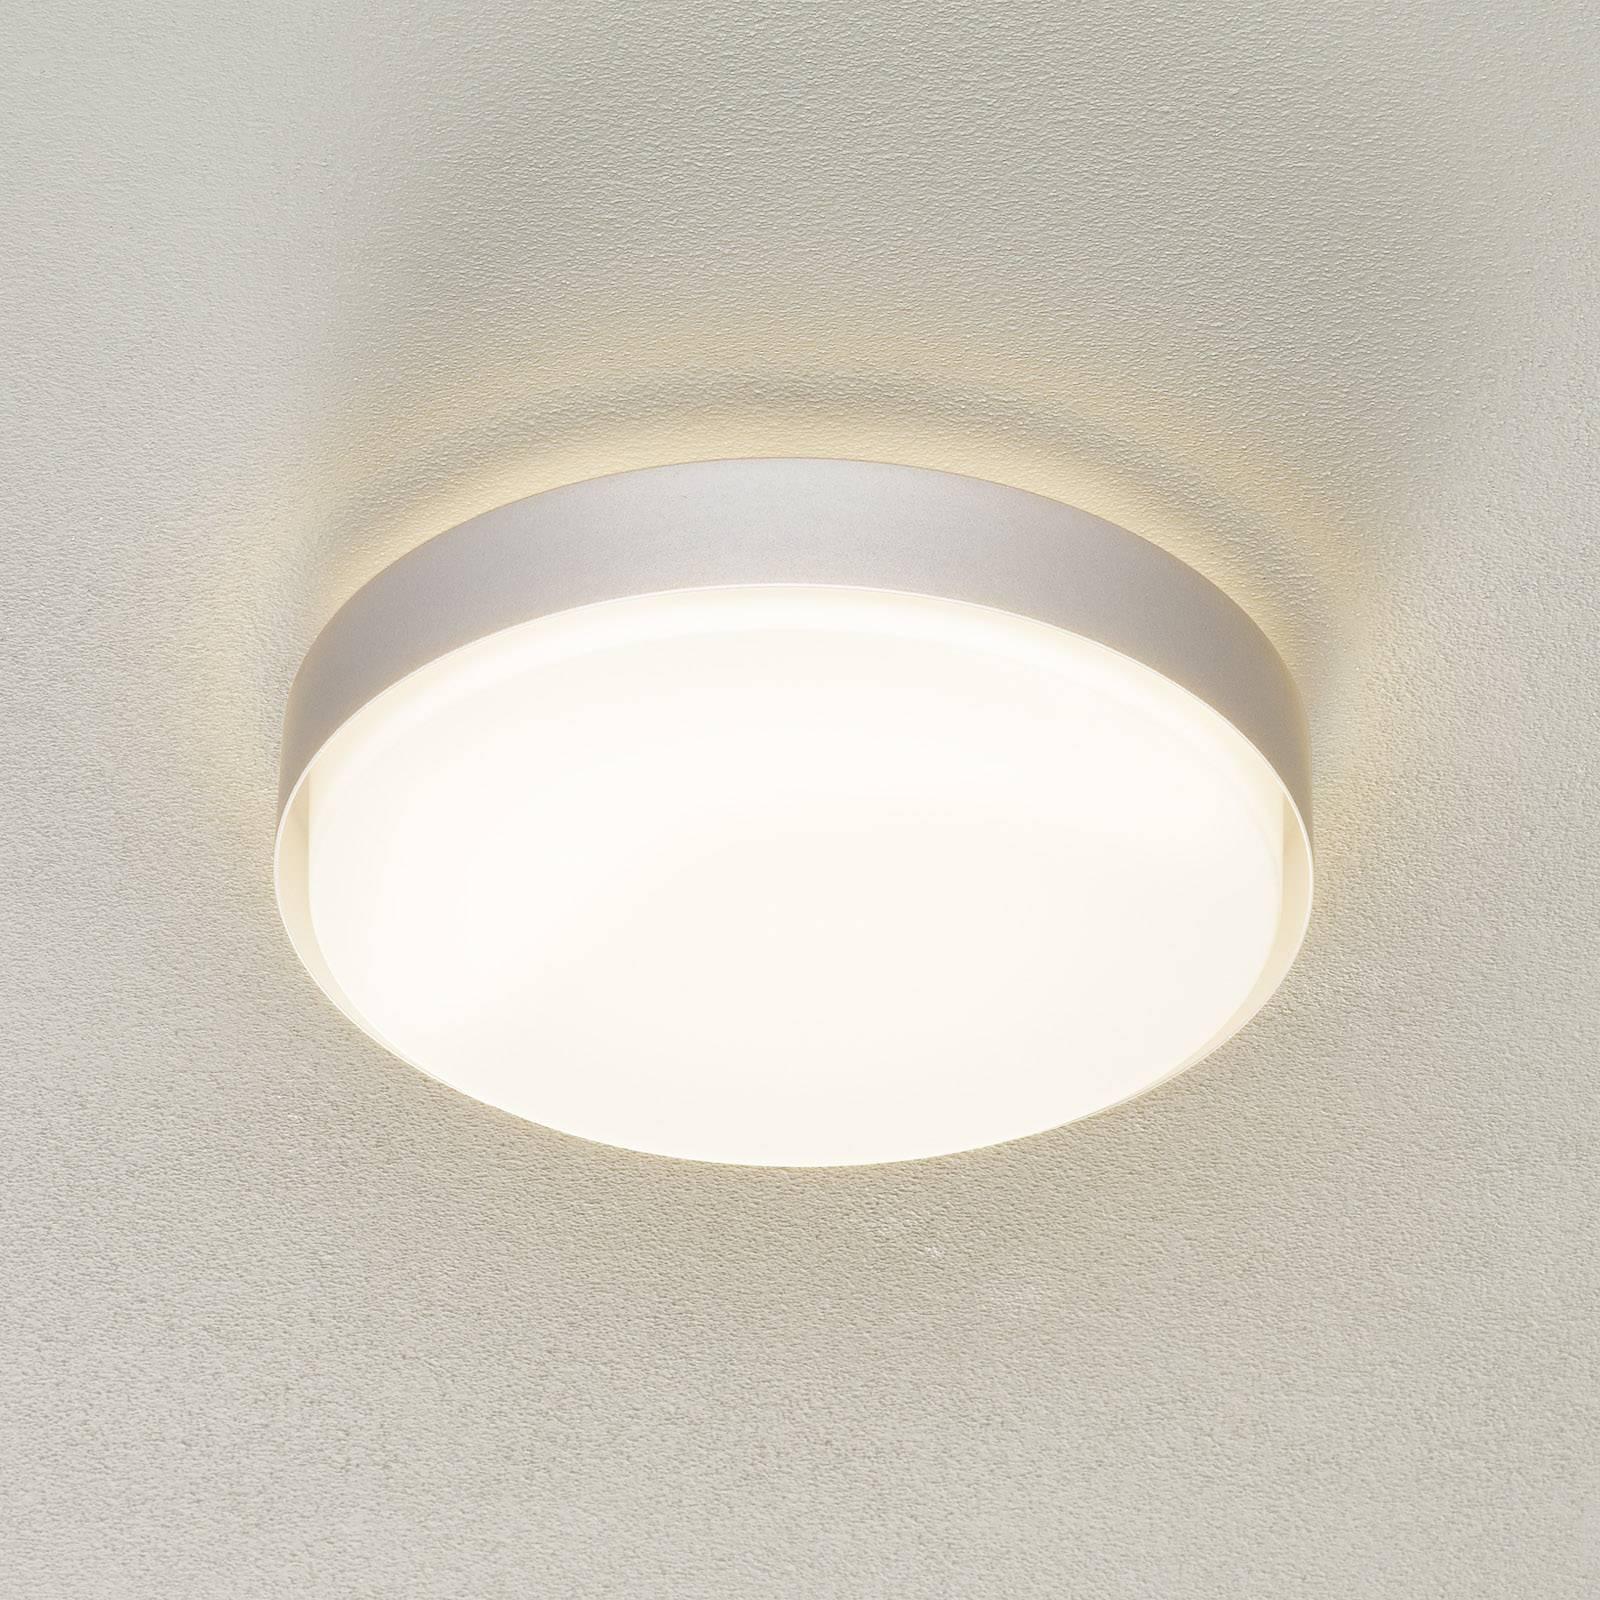 BEGA 34278 LED-Deckenleuchte, alu, Ø 36 cm, DALI